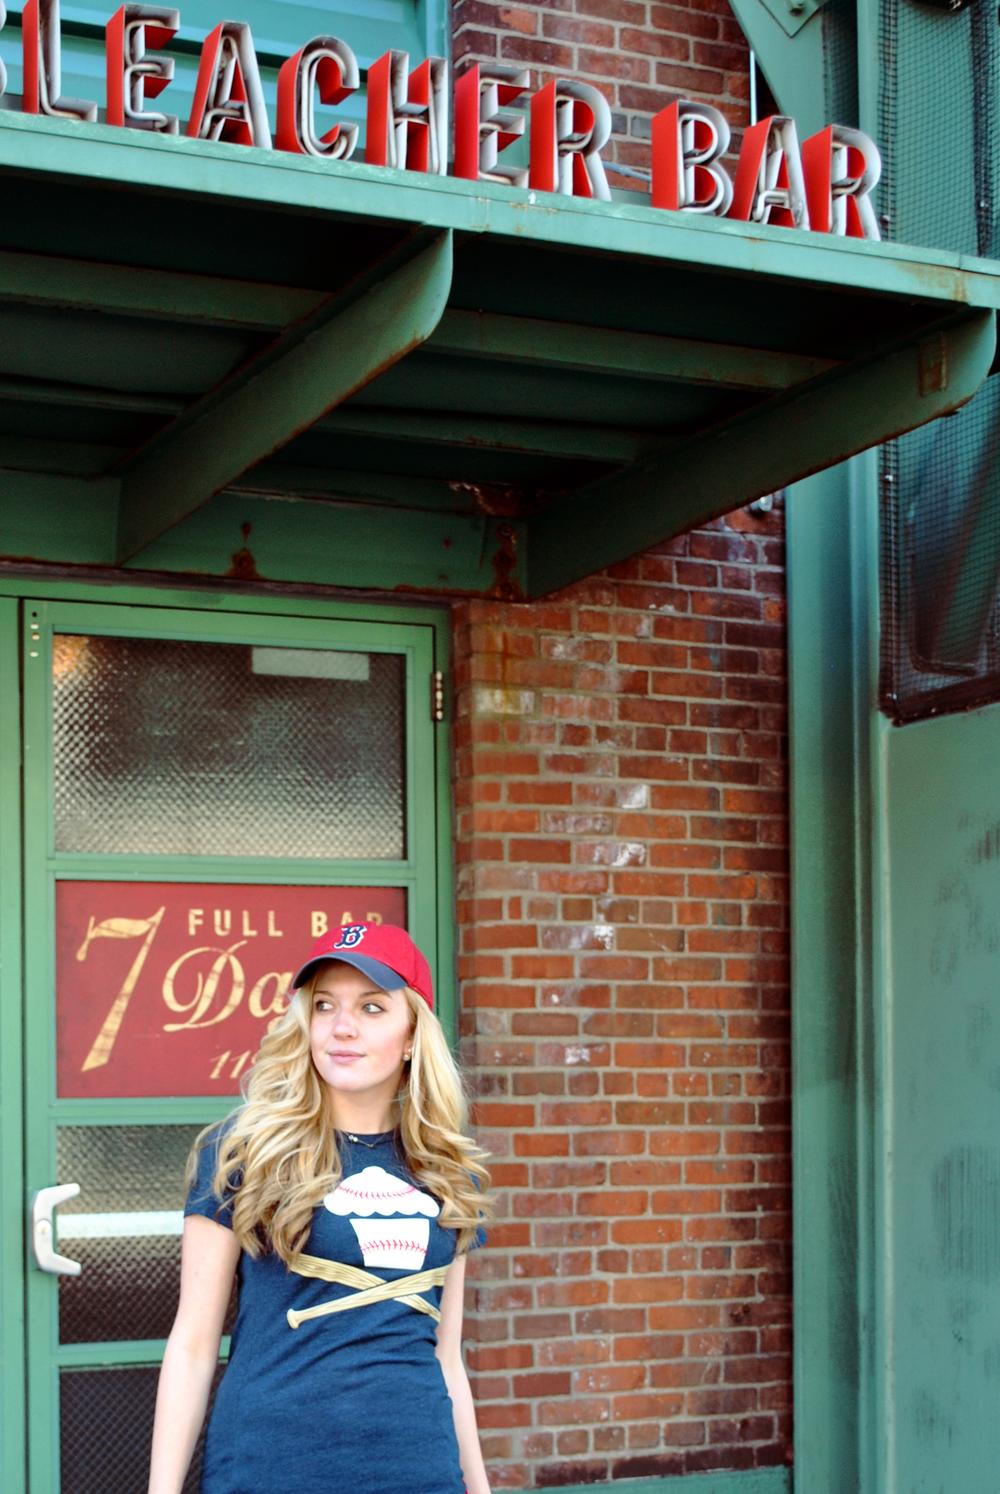 thoughtfulwish | boston // baseball // preppy fashion // red sox fashion // #myfenway // the loft // kate spade // meredith wish // bleacher bar